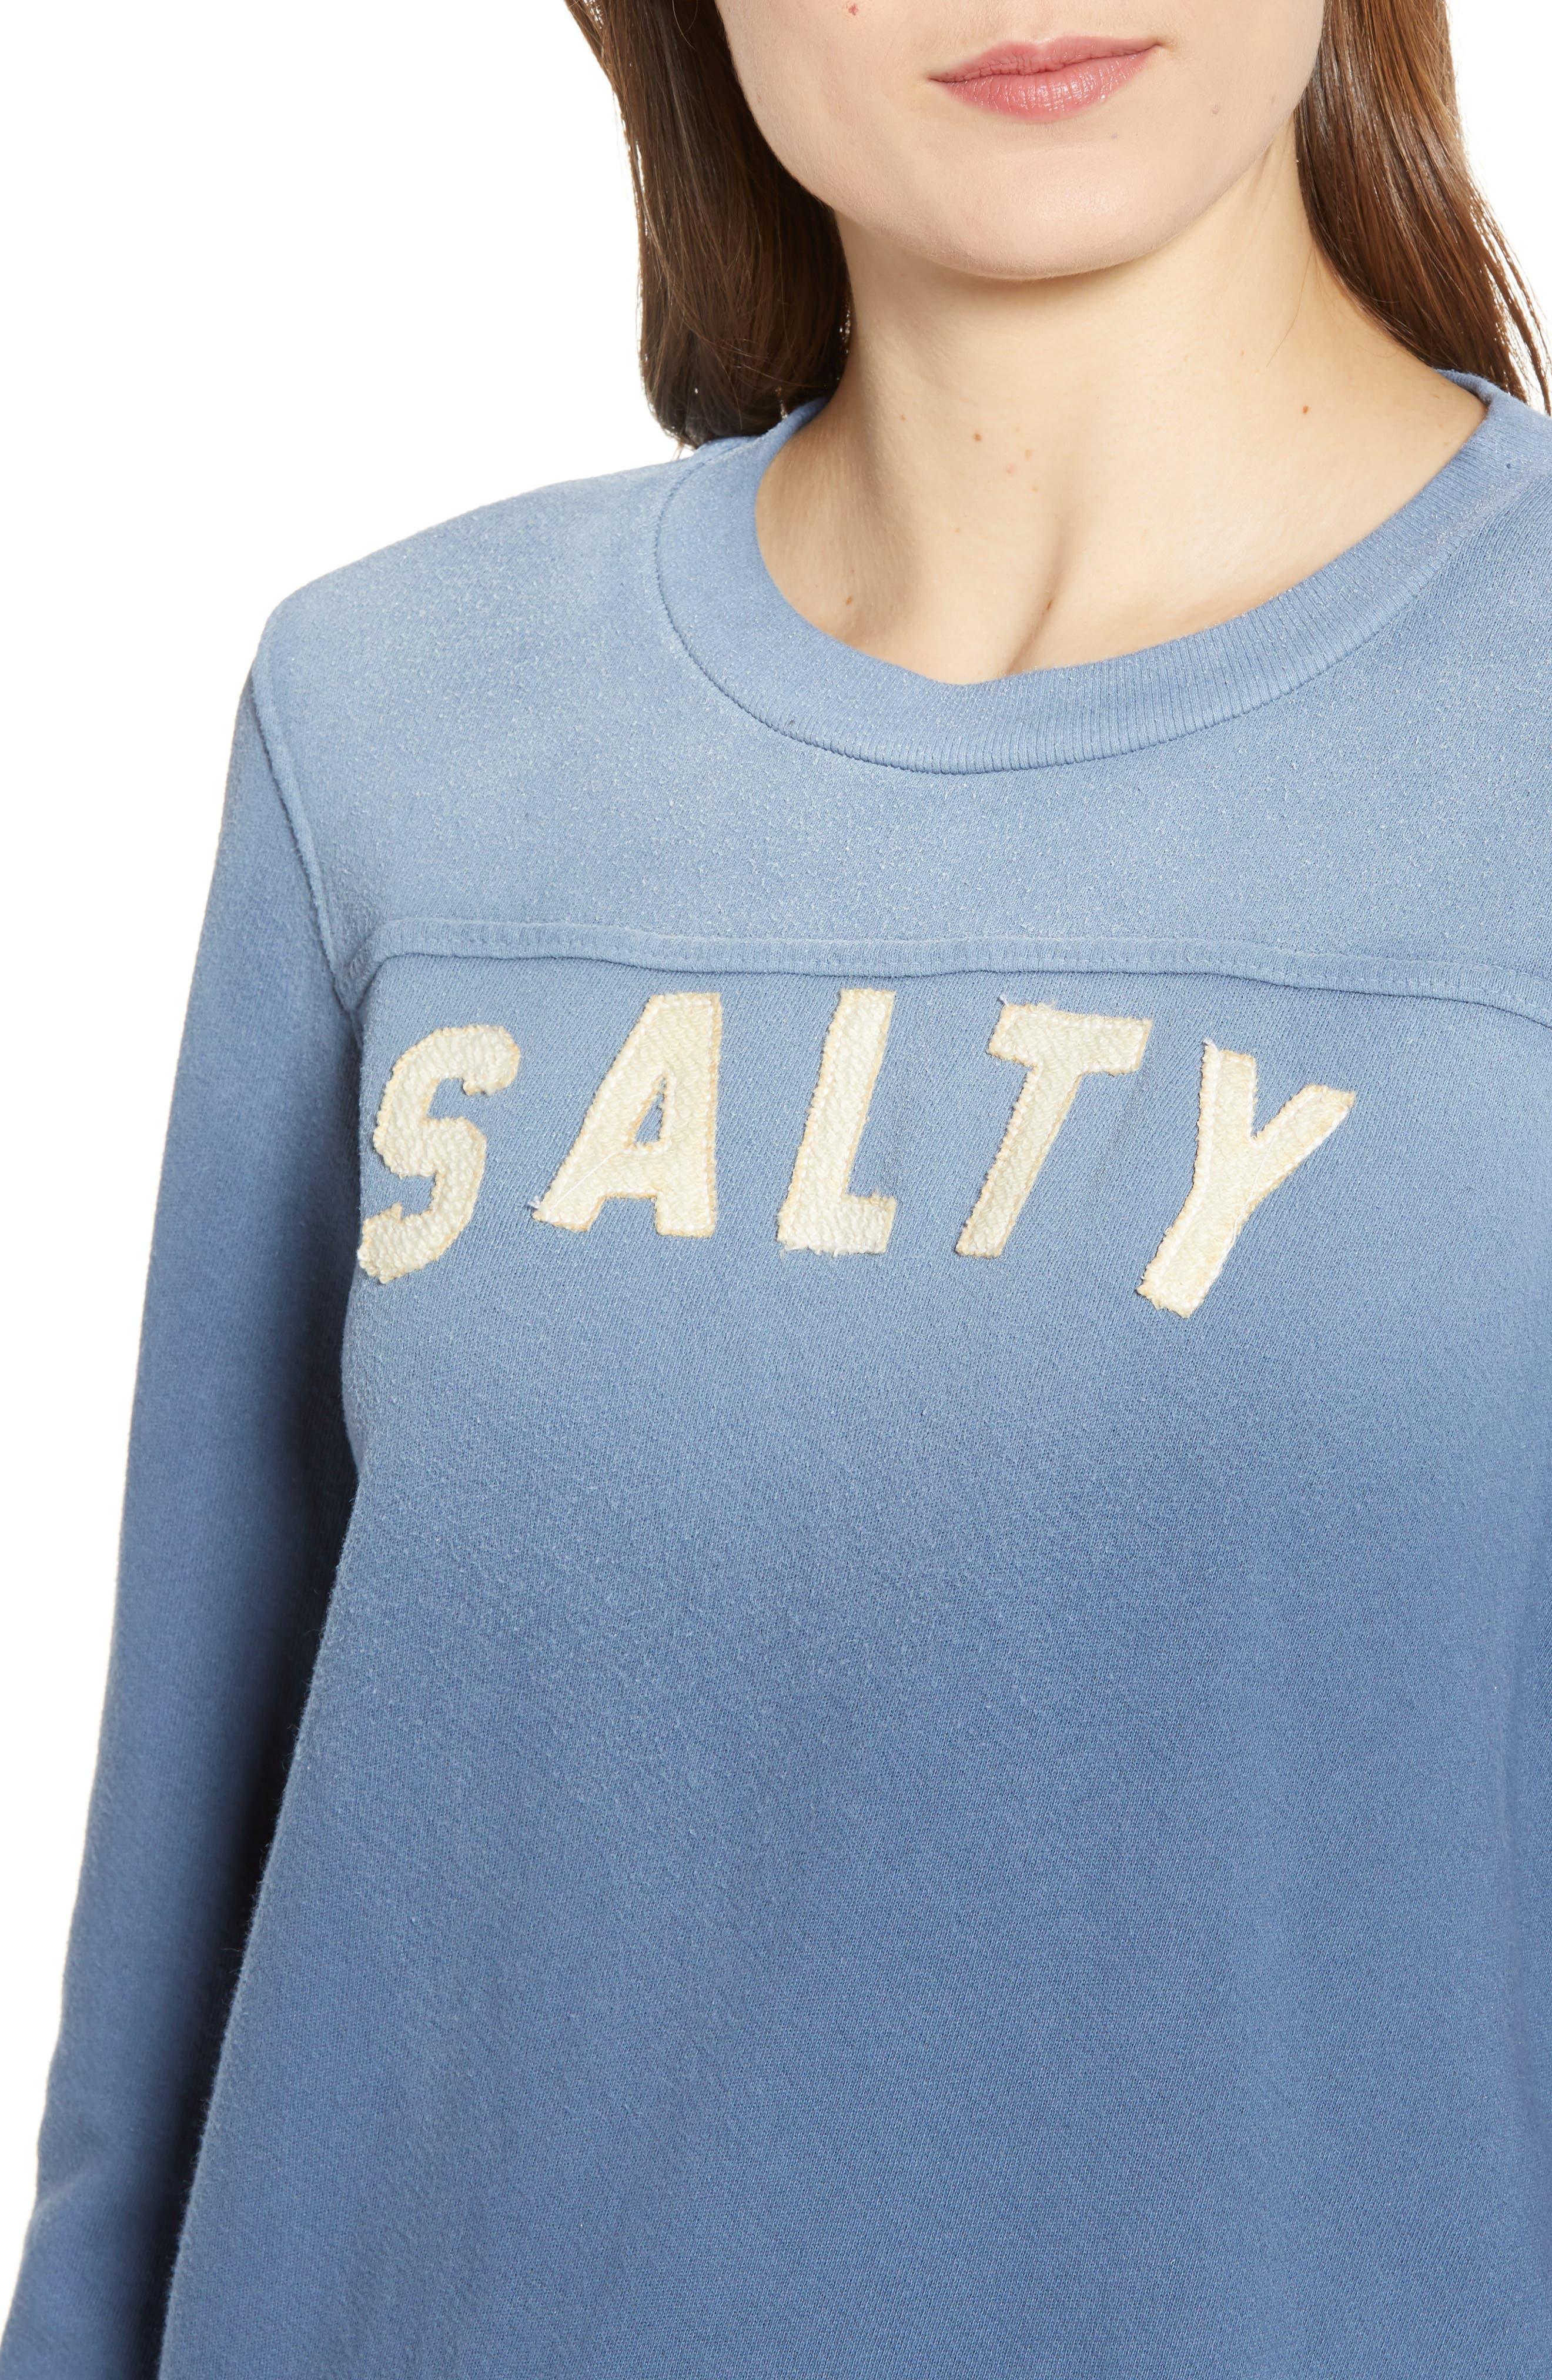 MOTHER, 1/2 & 1/2 Sweatshirt, Alternate thumbnail 4, color, SALTY